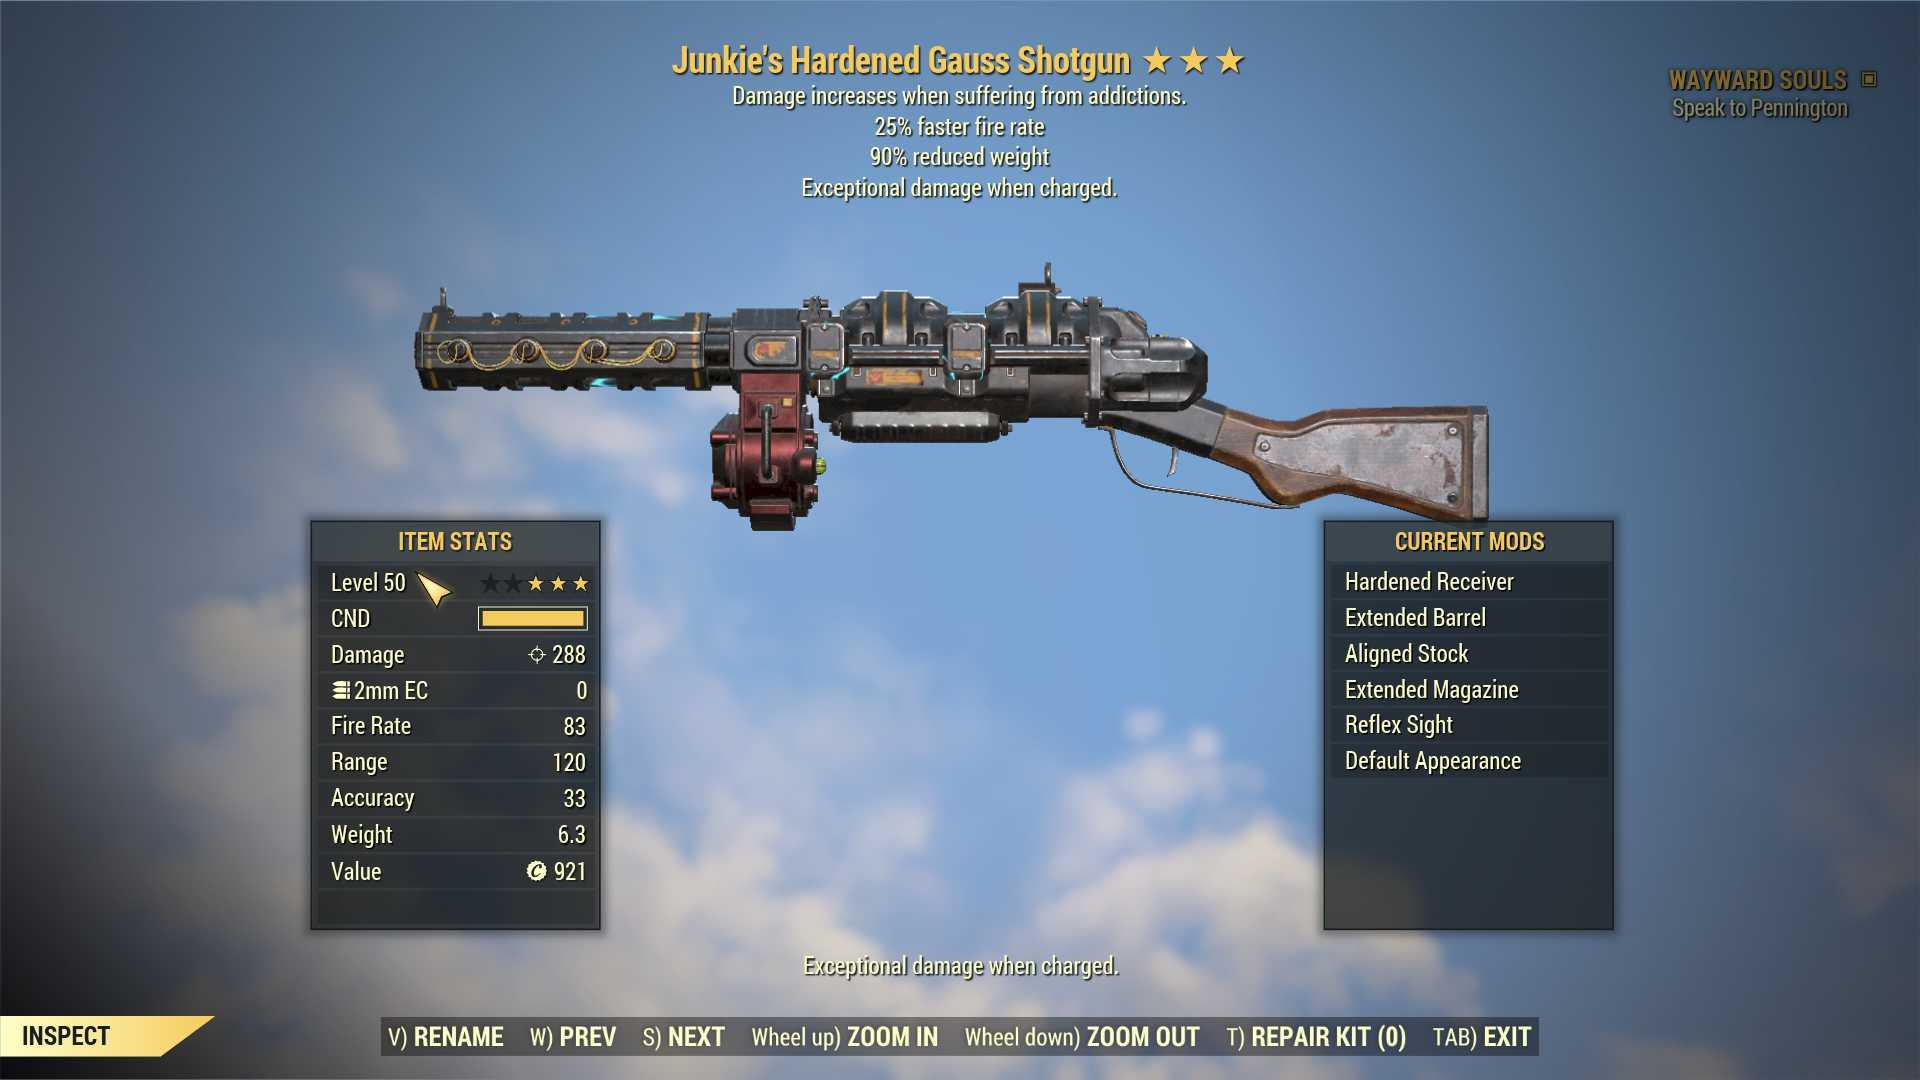 Junkie's Gauss Shotgun (25% faster fire rate, 90% reduced weight) FULL MODDED [Wastelanders]